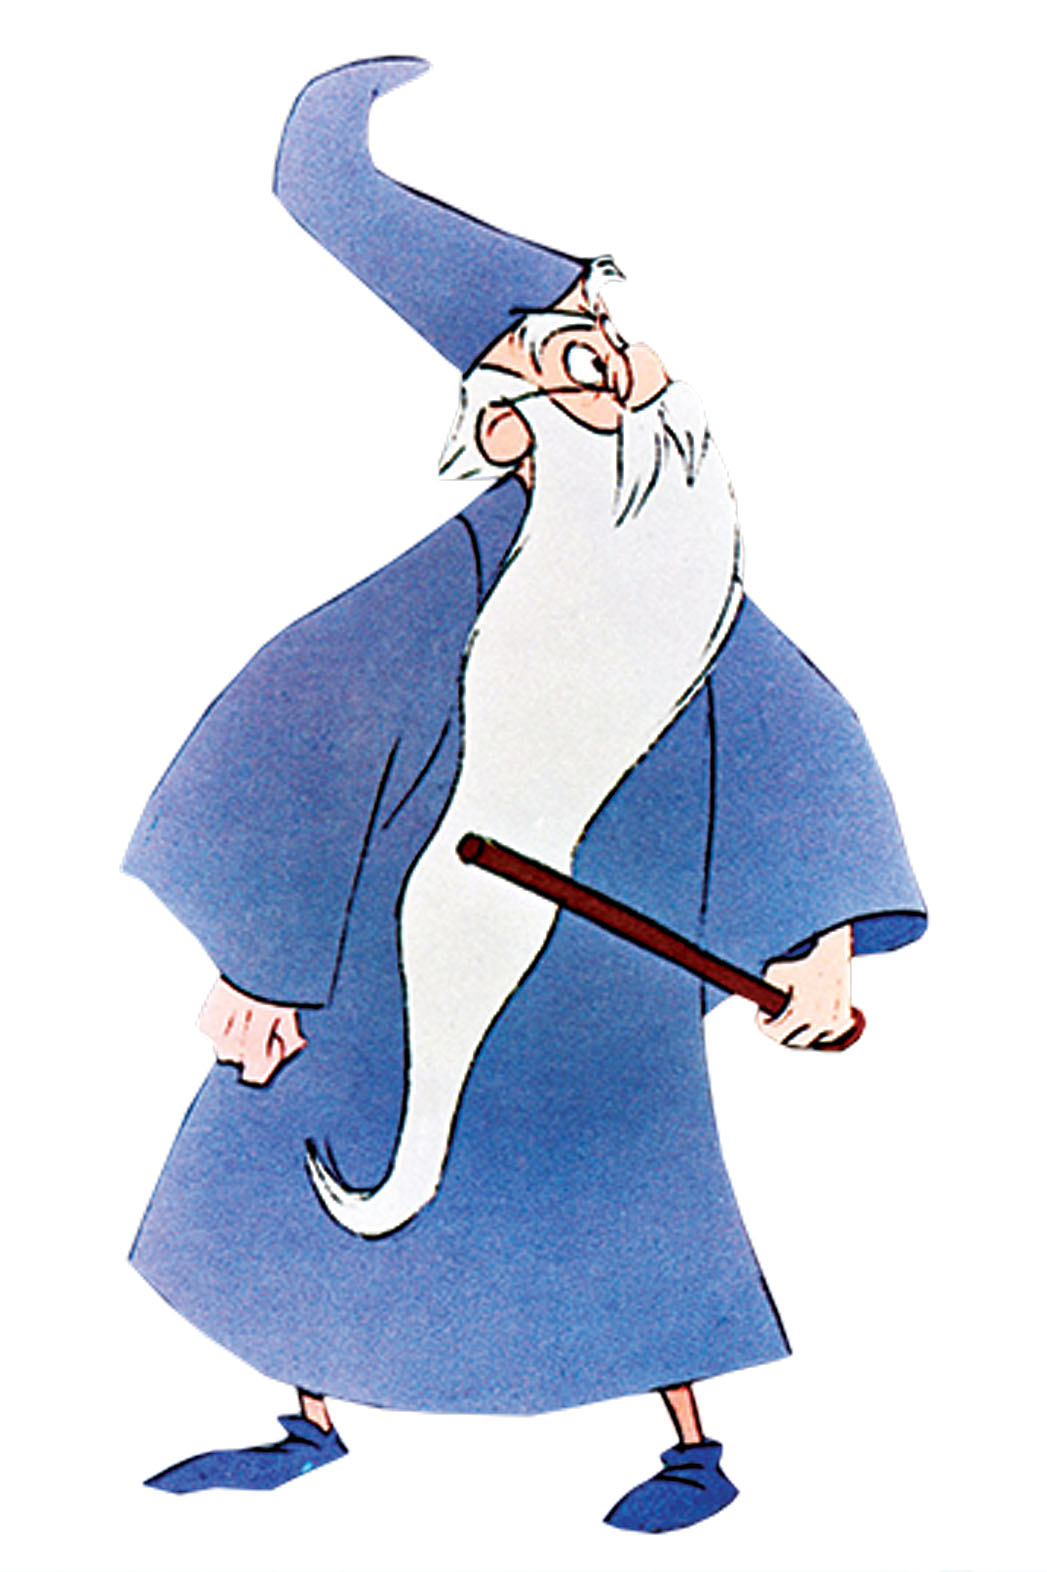 Merlin Animation - P 2013